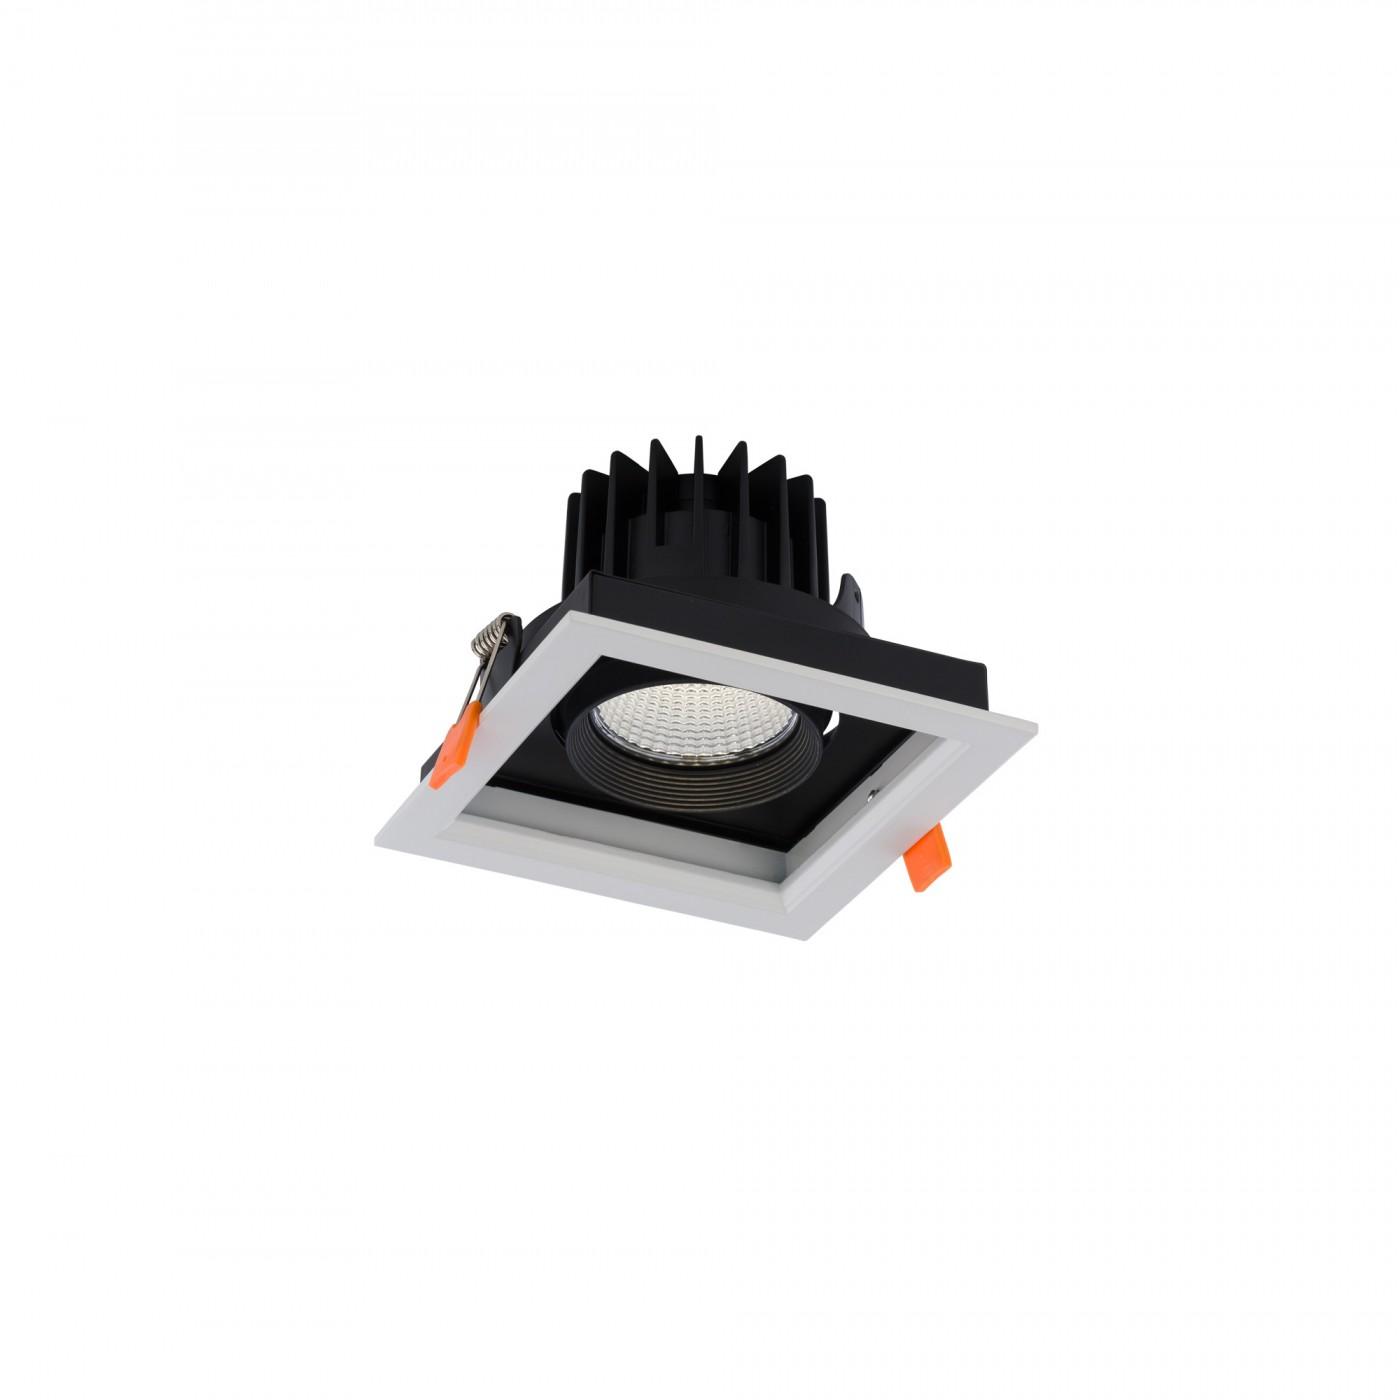 CL DIA LED 18W 4000K white-black 8721 Nowodvorski Lighting